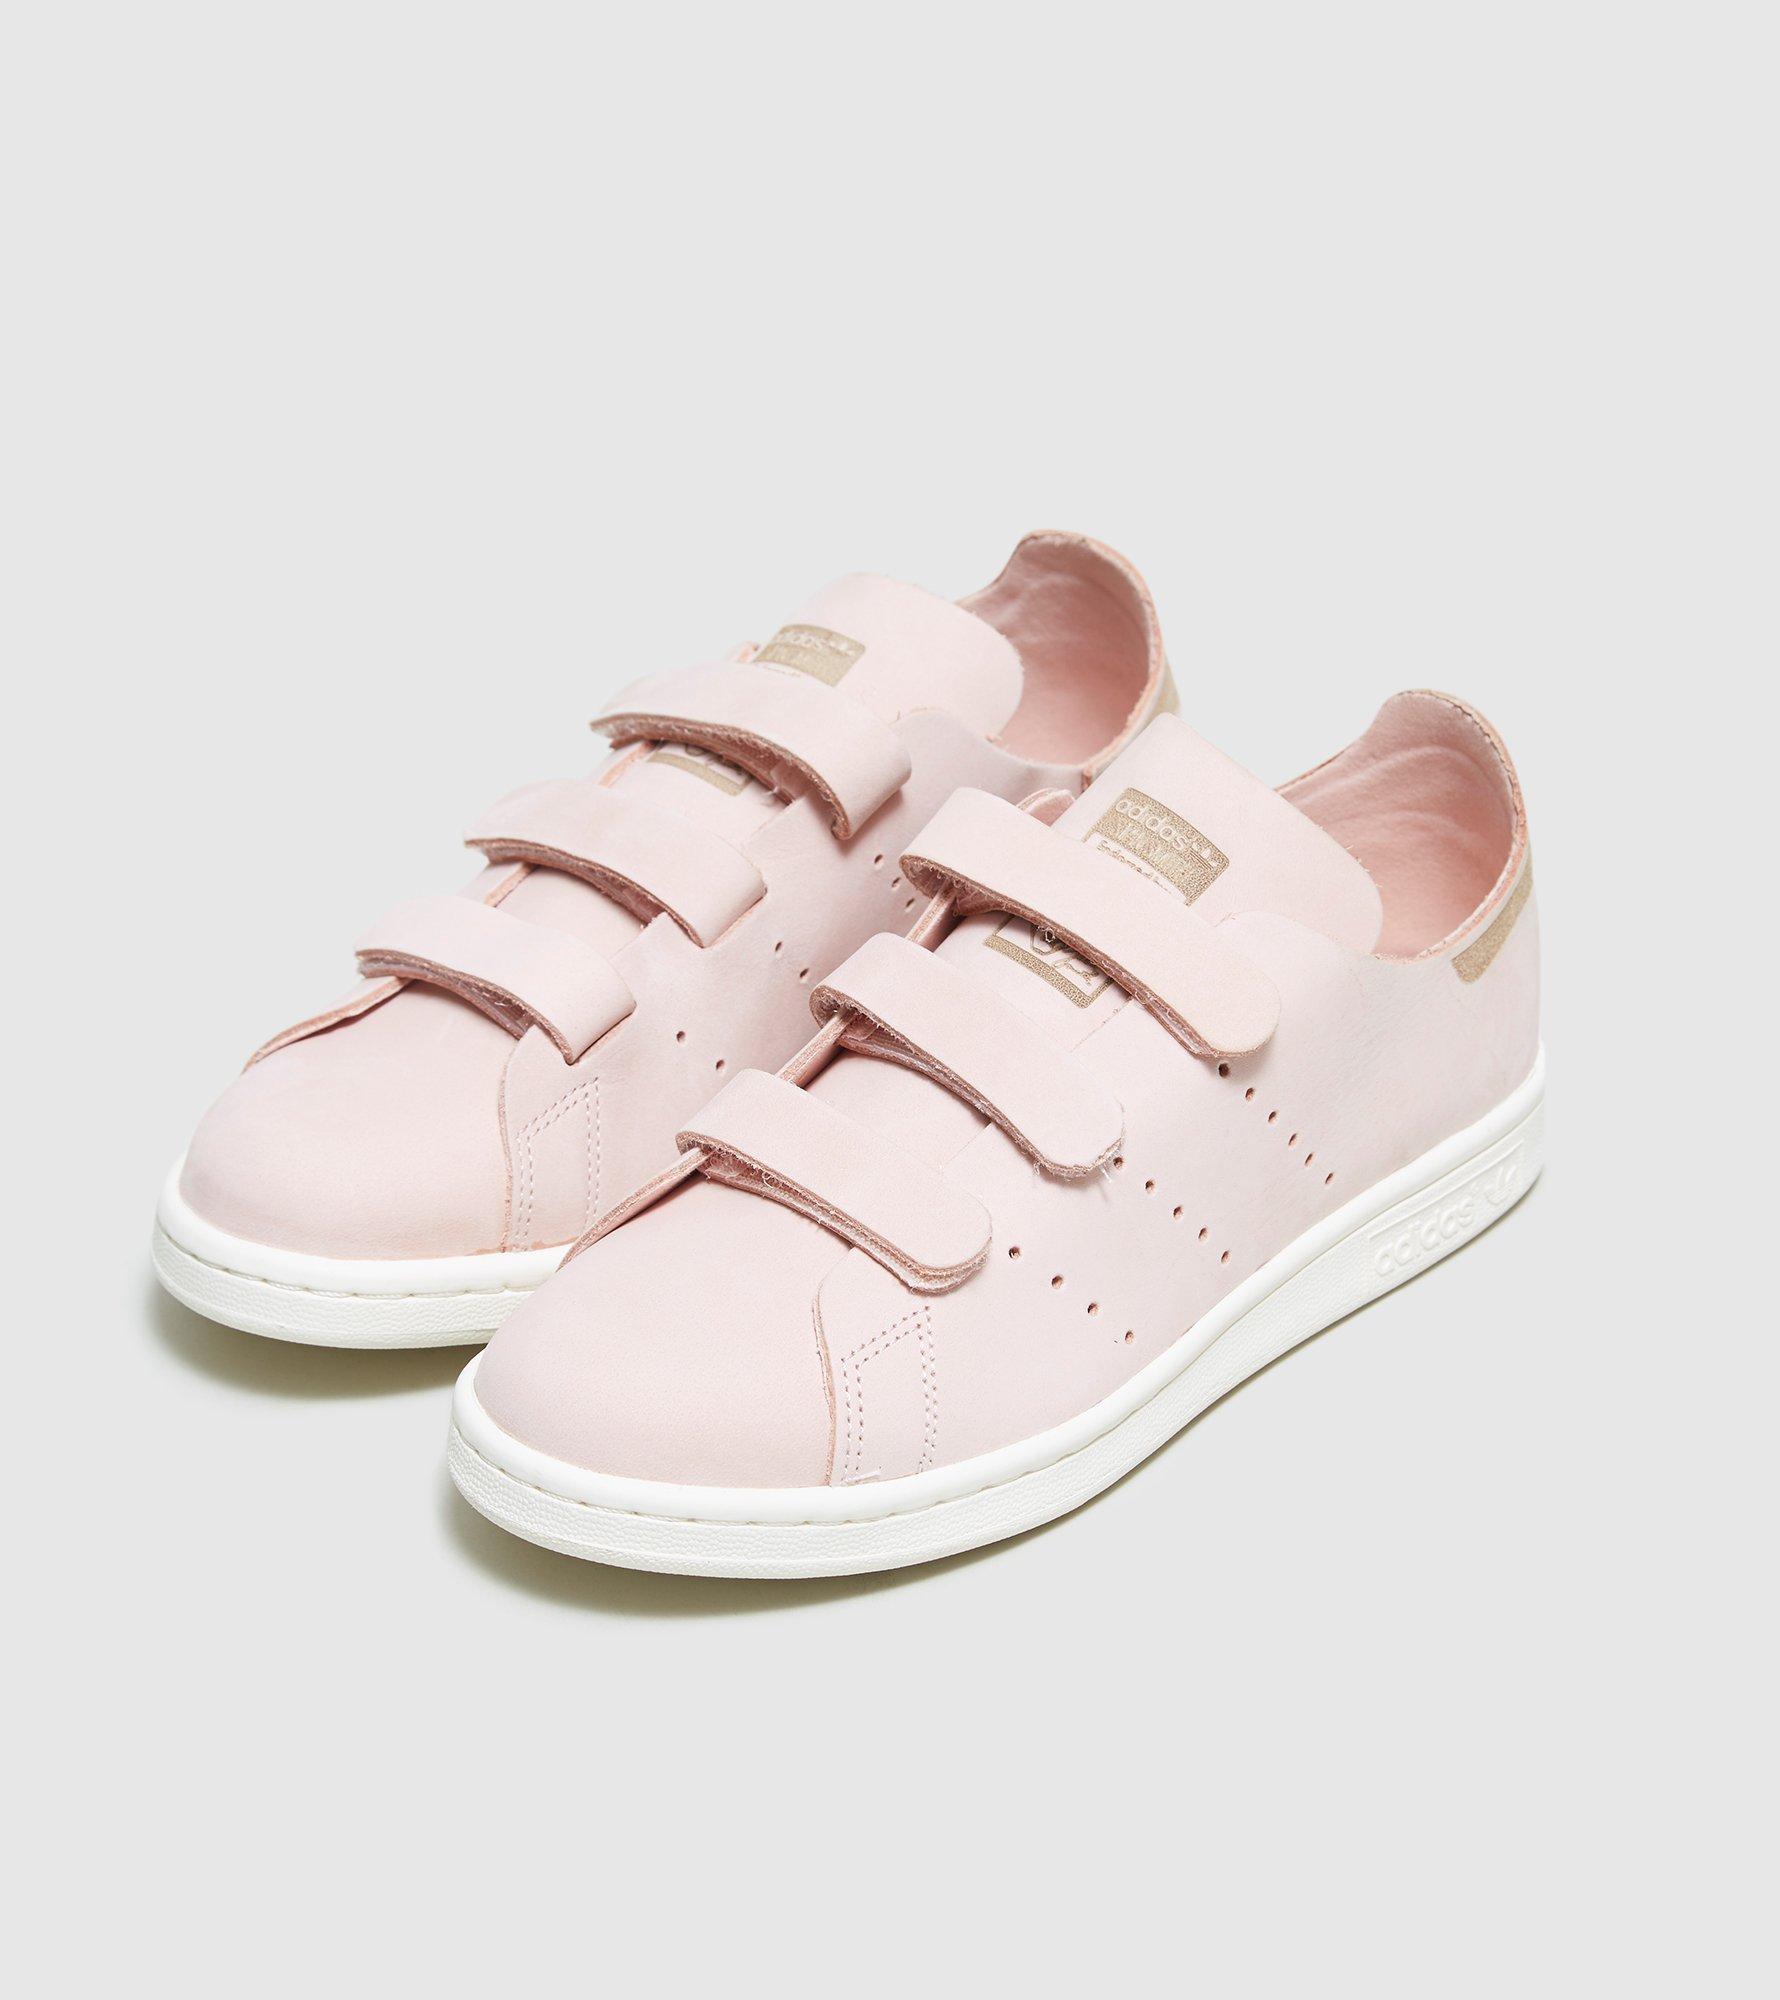 new arrivals 11c02 20430 Lyst - adidas Originals Stan Smith Op Cf Womens in Pink